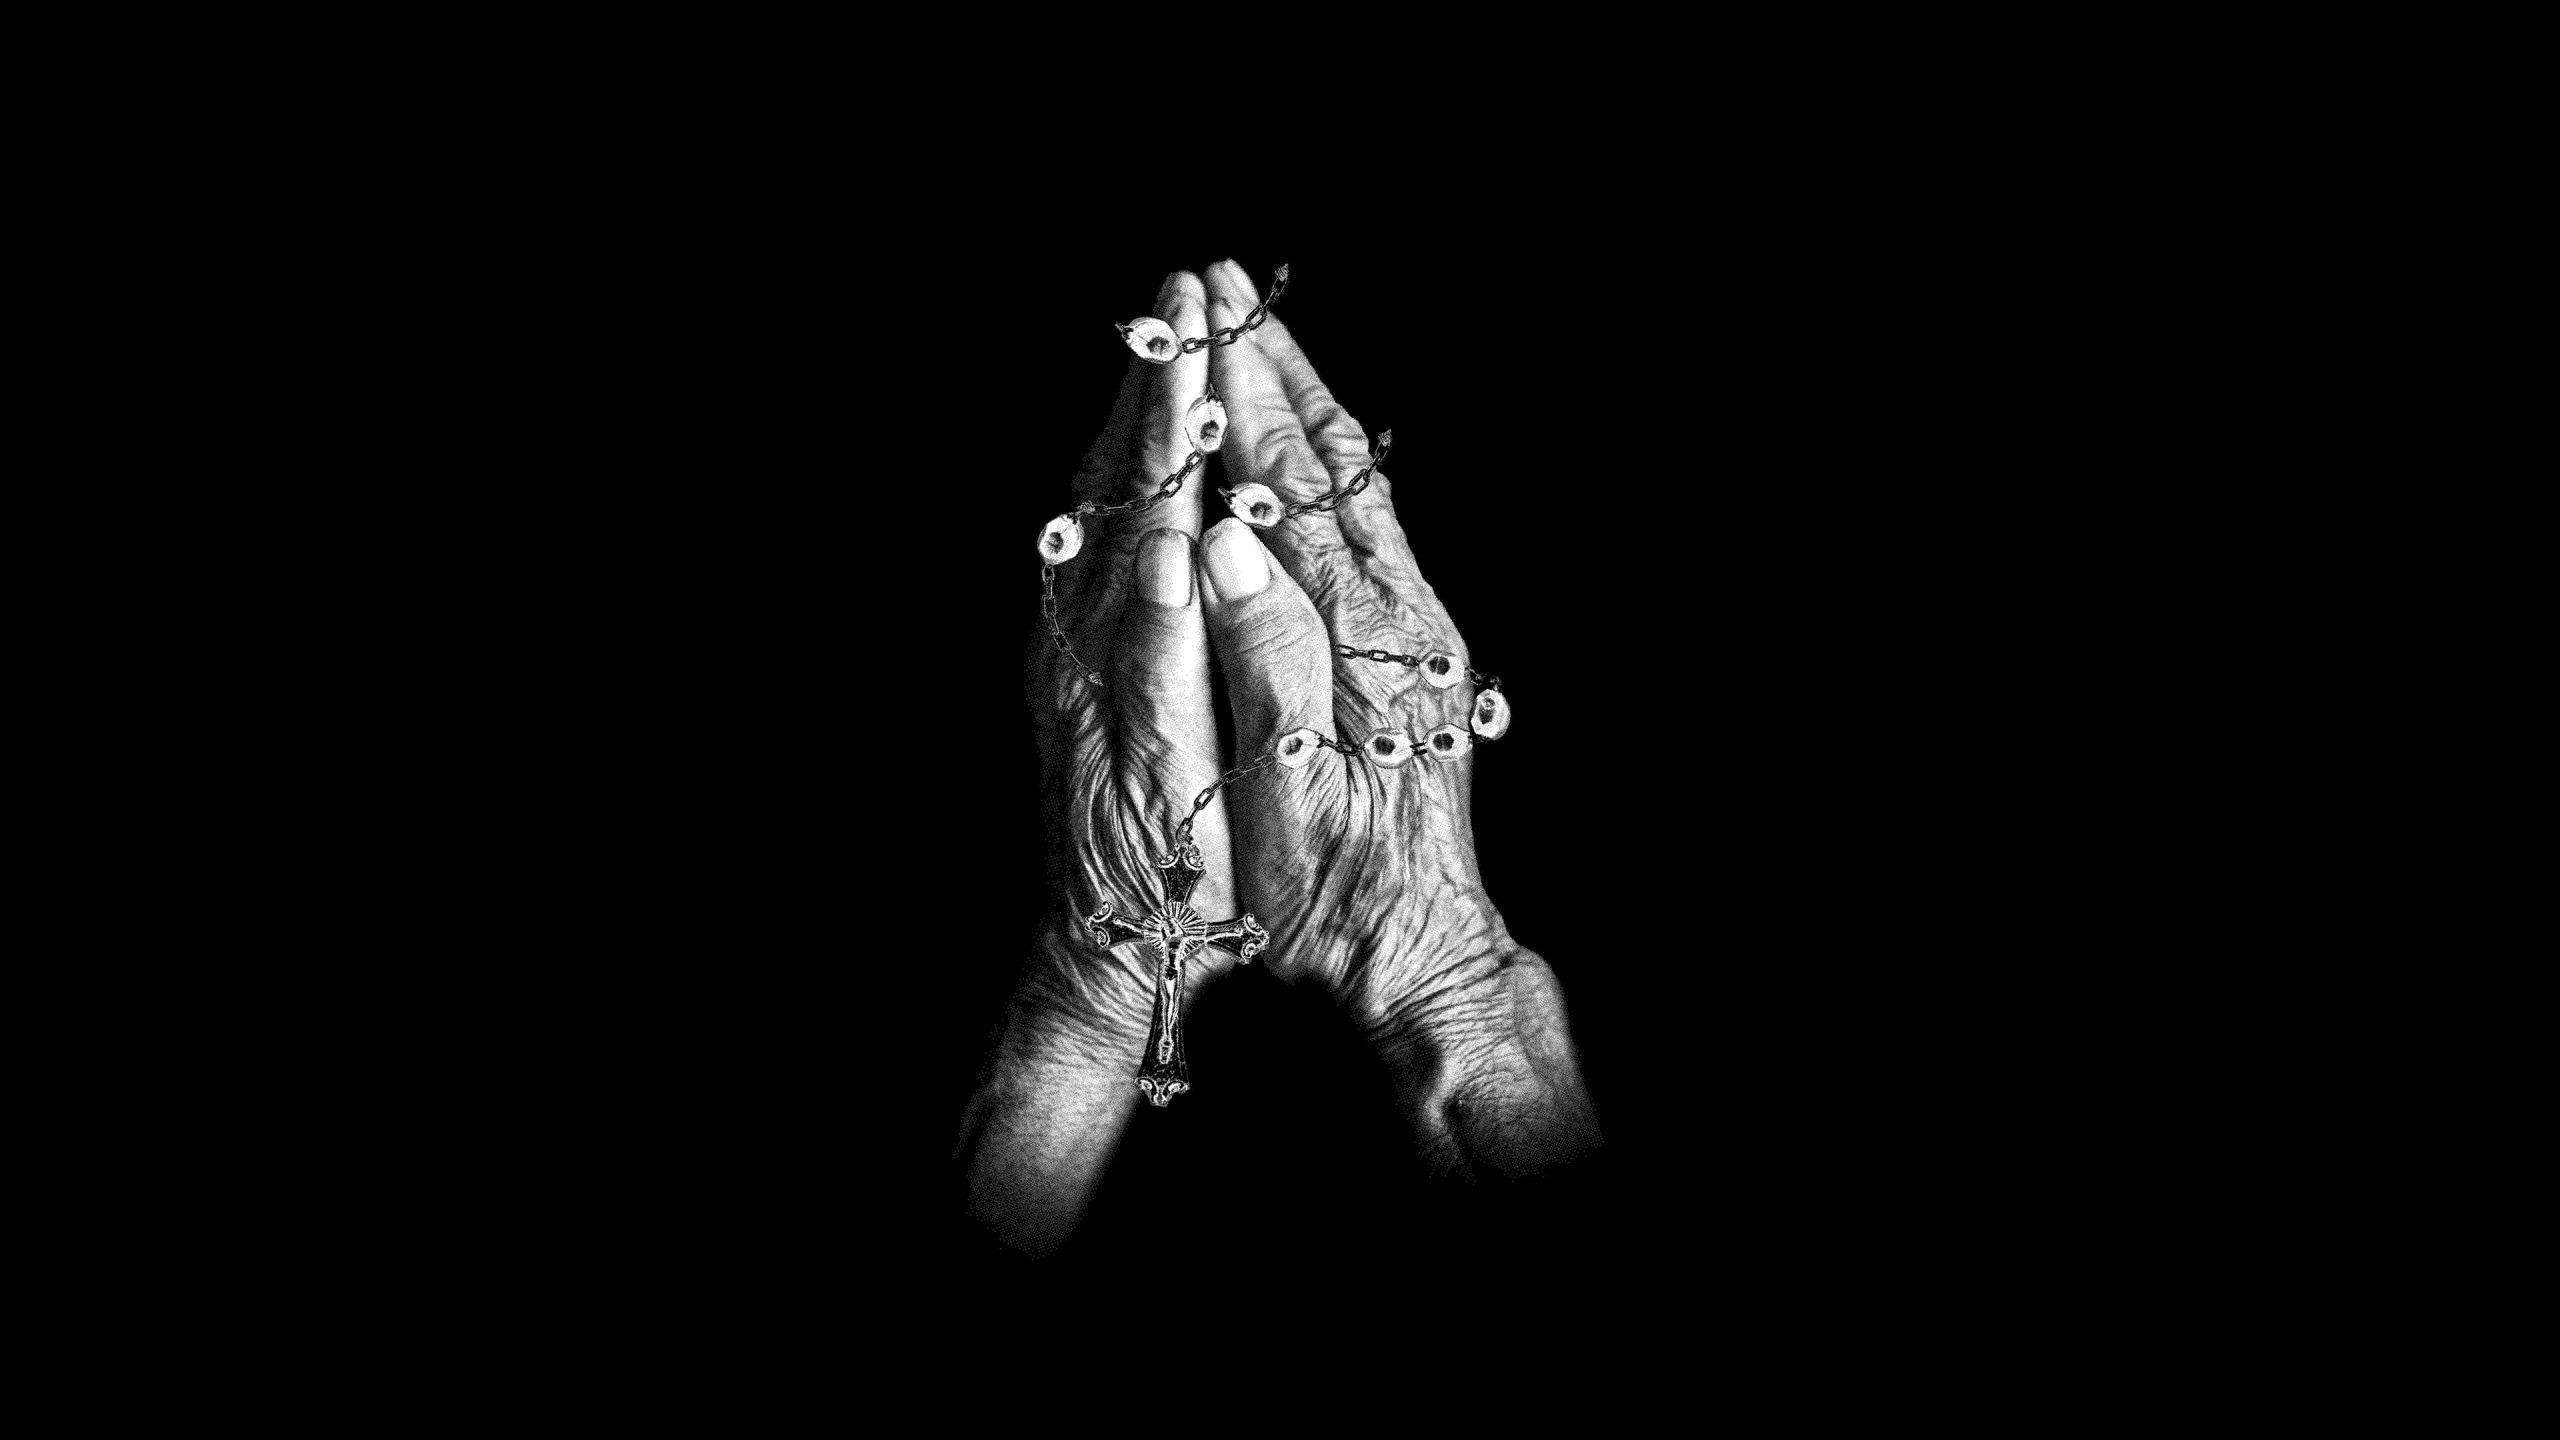 GUE-PEQUENO-SINATRA-merch-graphics-hands-02